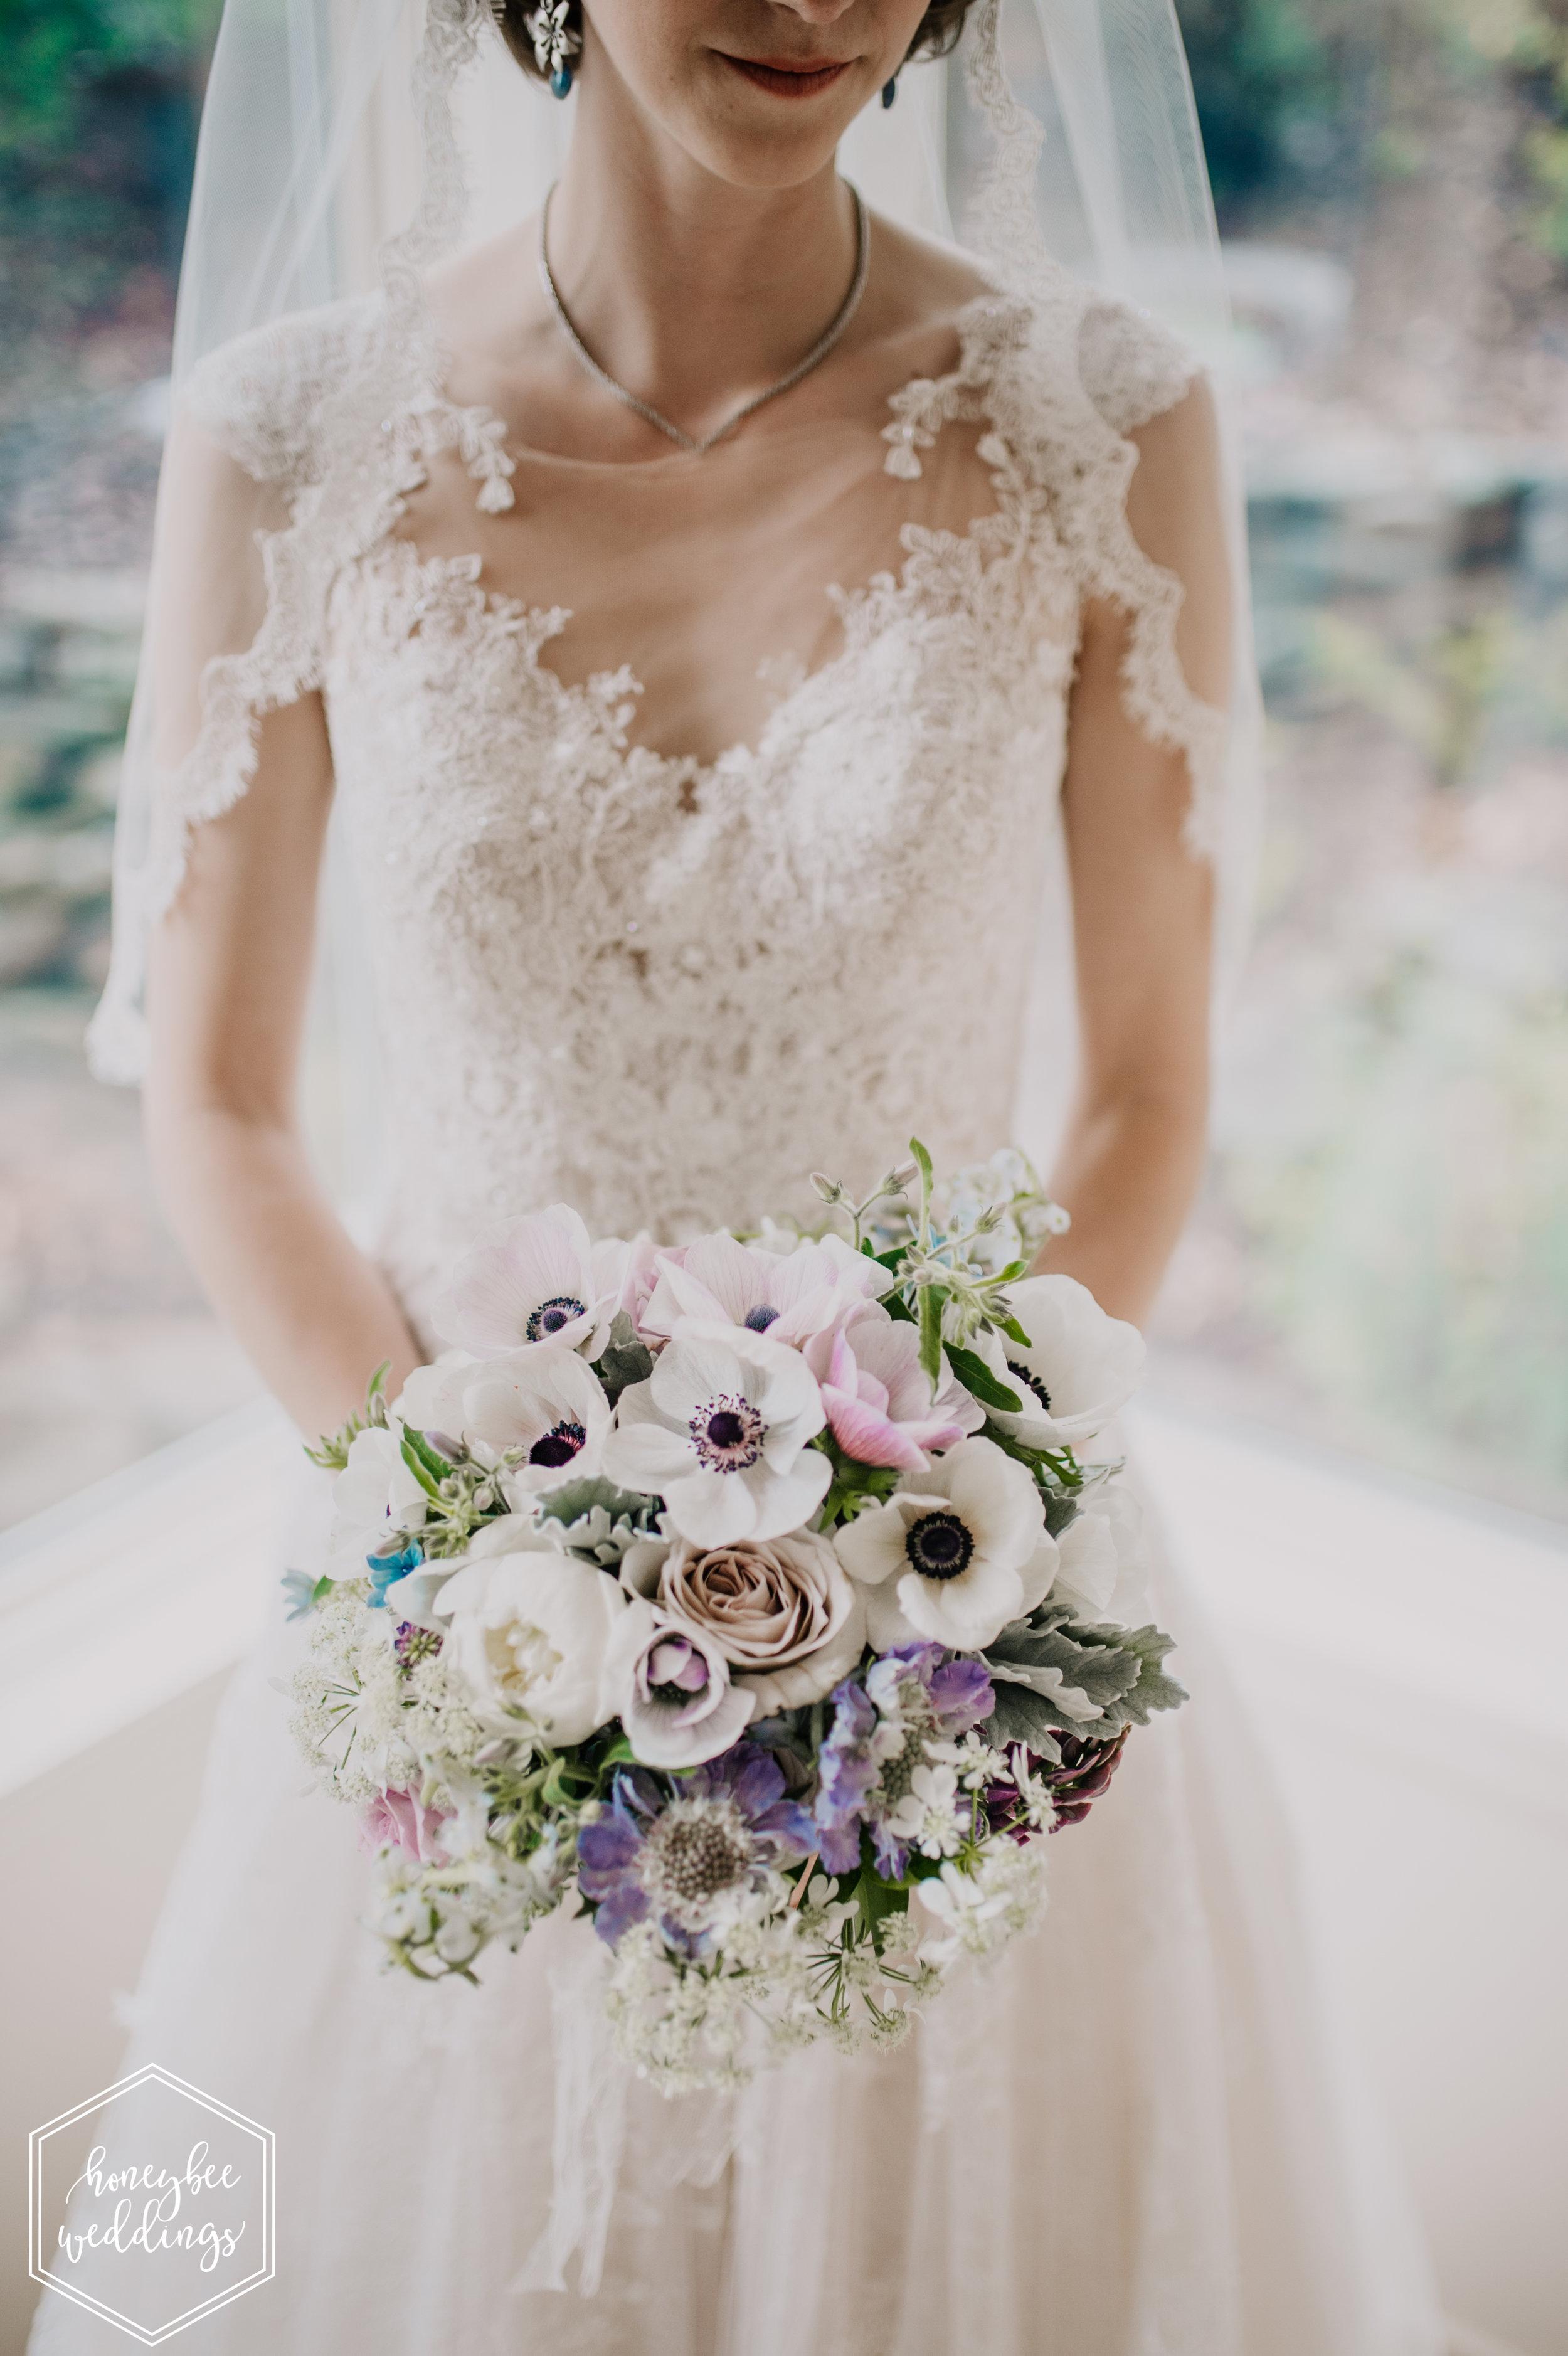 153 Riverside Country Club Wedding_Montana Wedding Photographer_Lauren Jackson + Evan Ivaldi 2018-7712.jpg